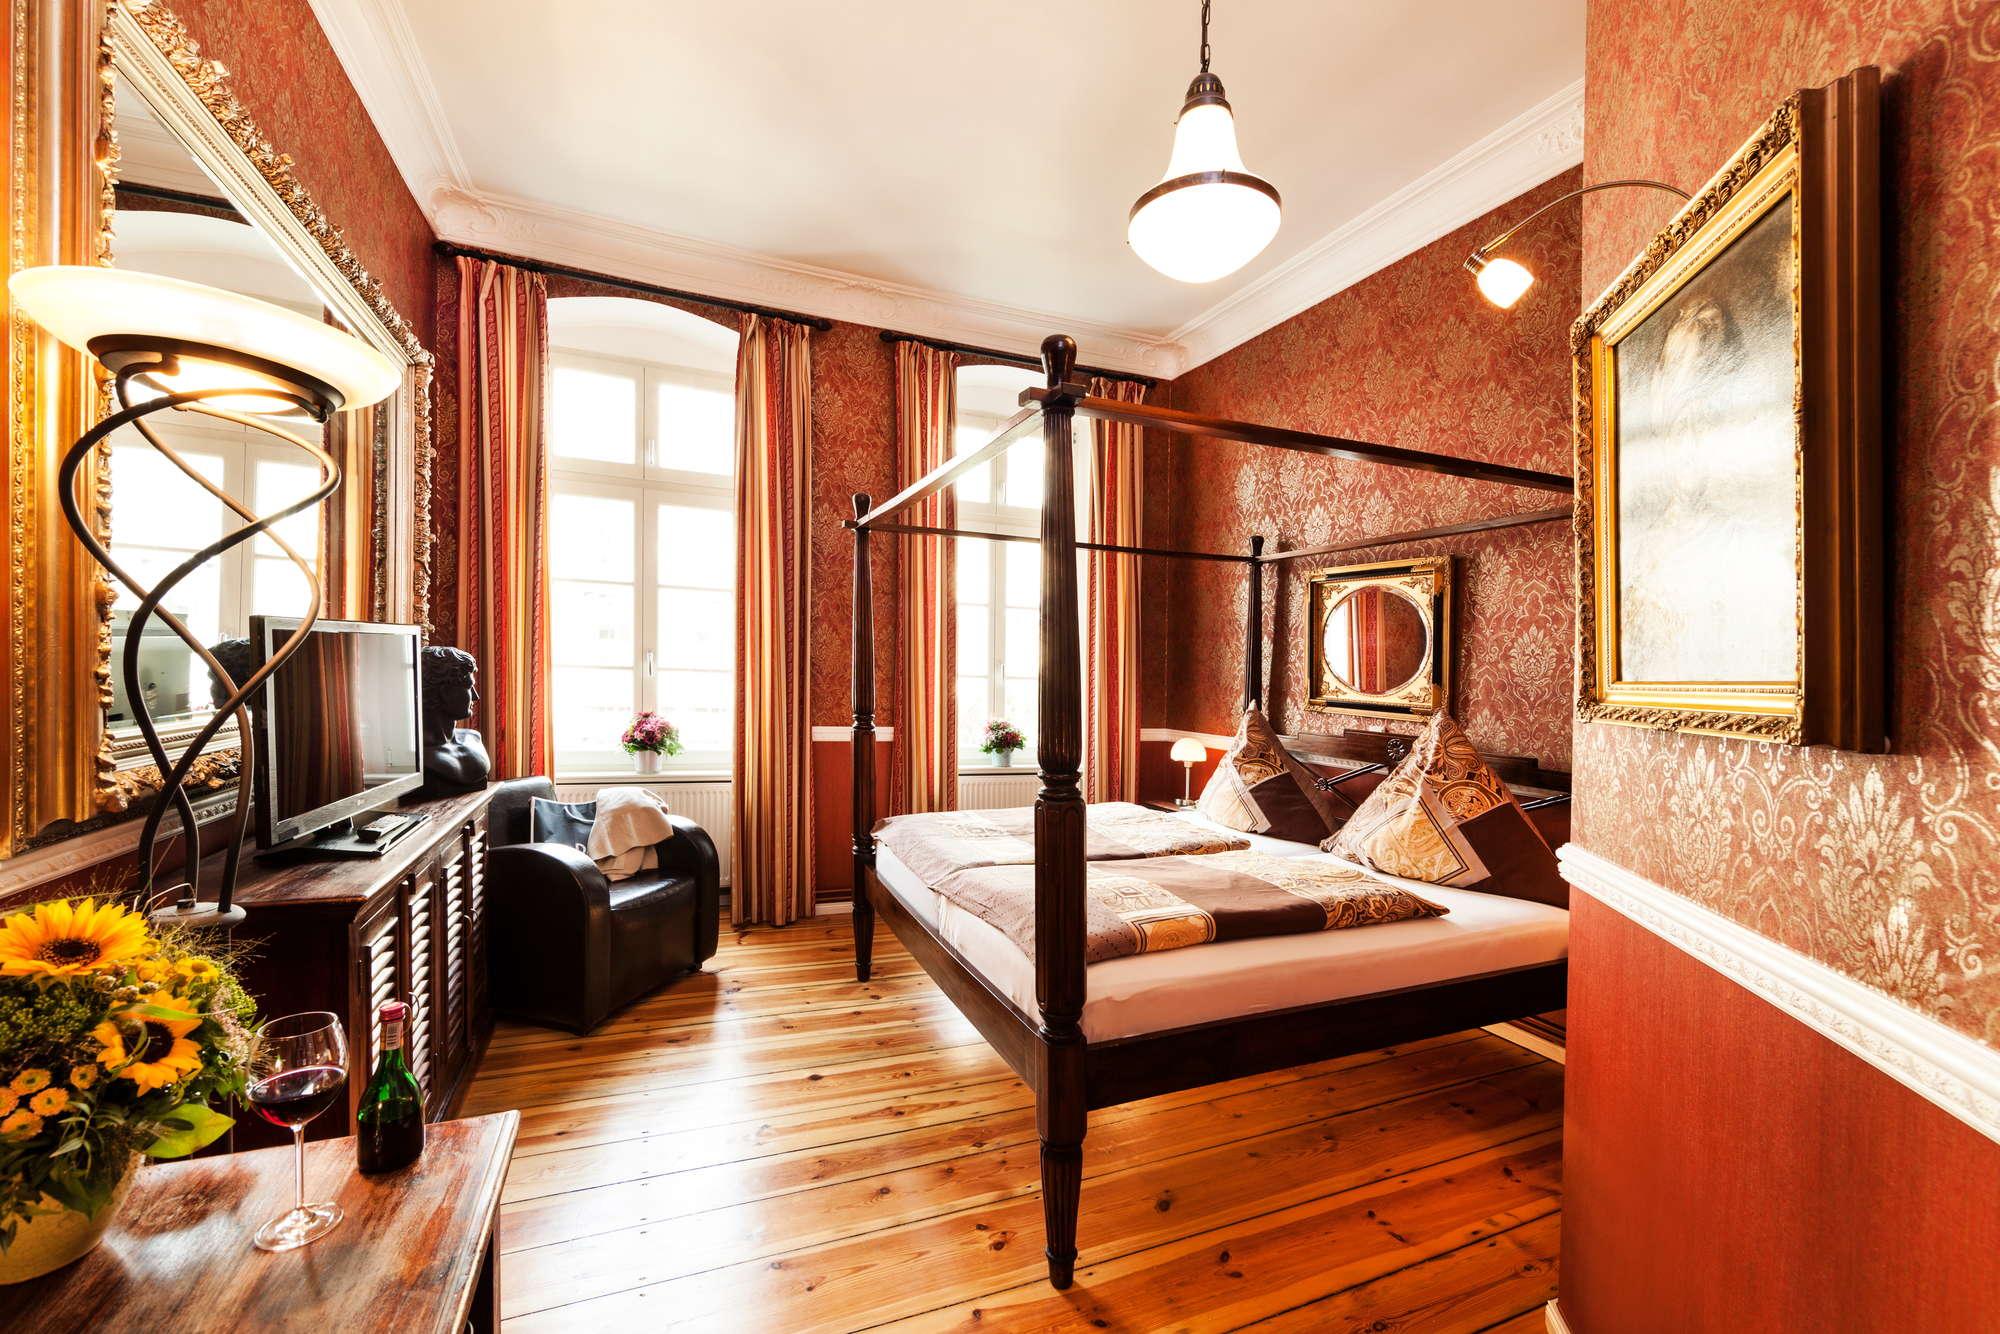 Honigmond Hotel and Garden Hotel Expert Review | Fodor\'s Travel